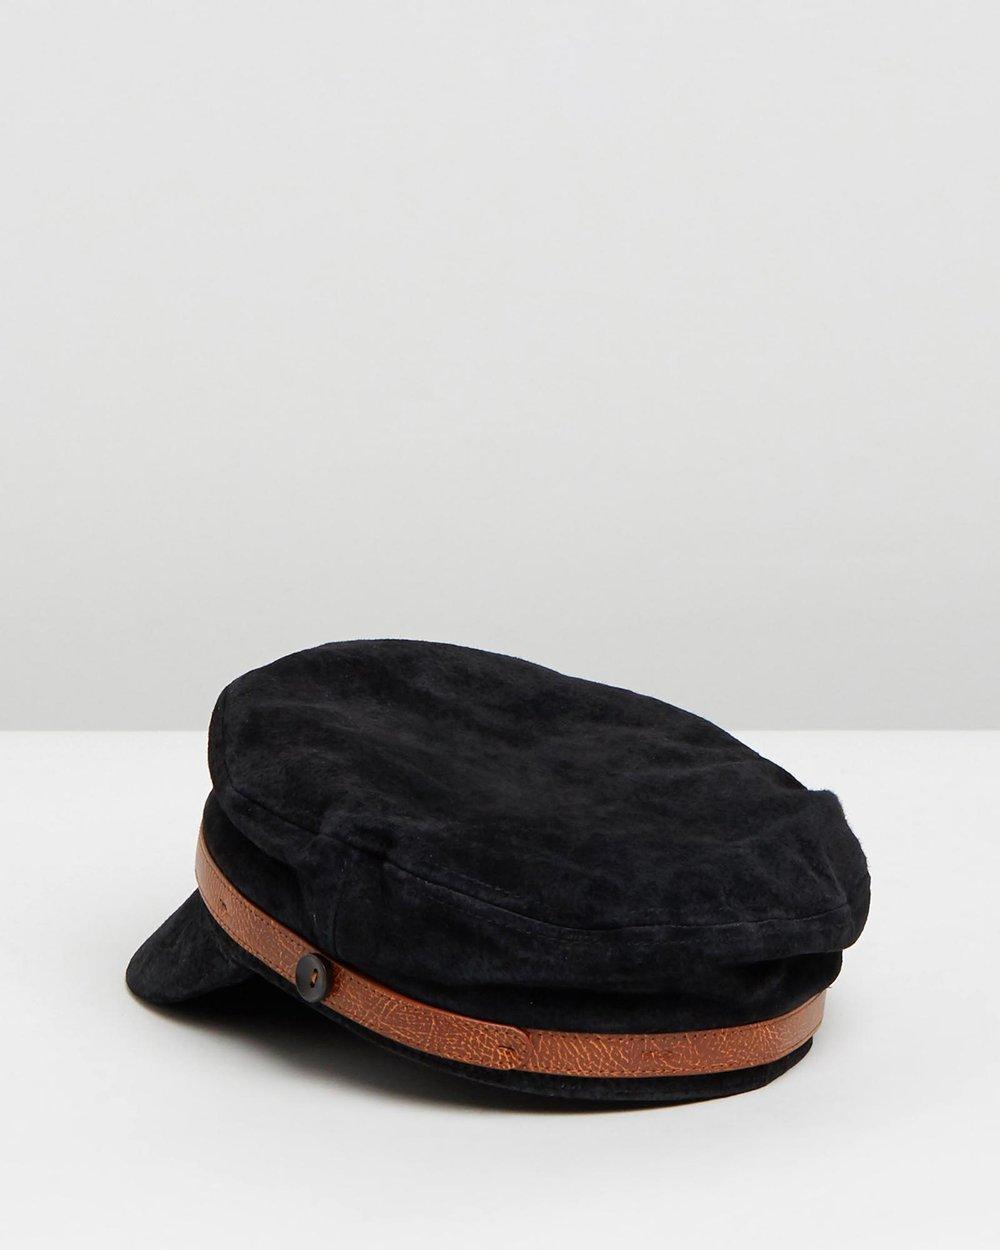 f3f0db20a3e The Skipper Hat by Billy Bones Club Online